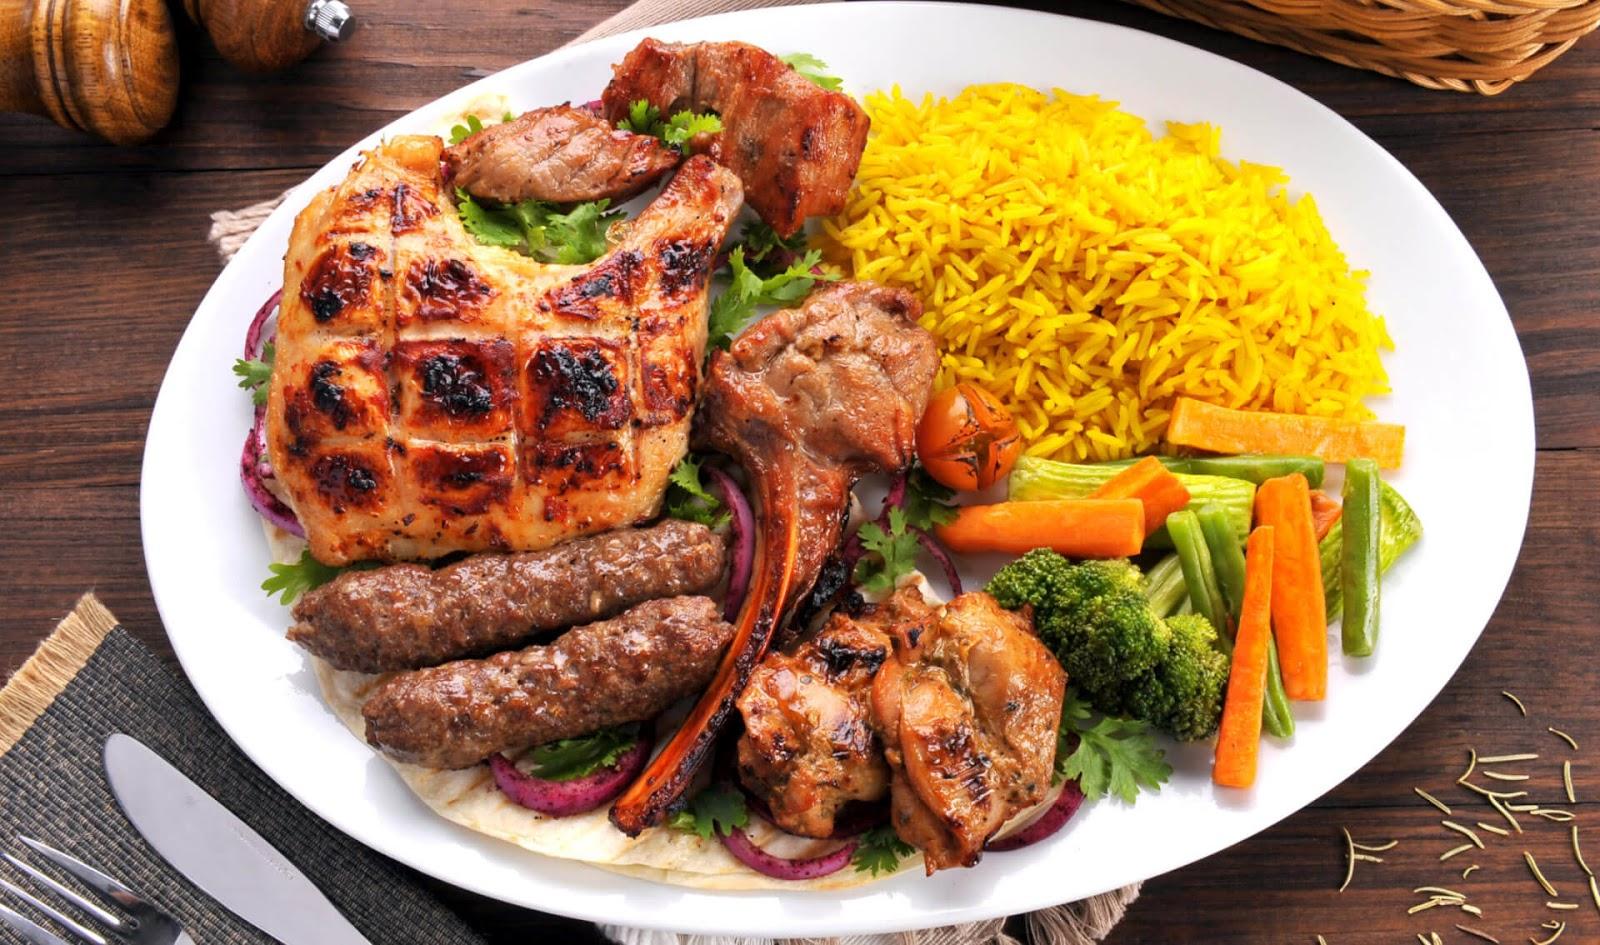 أسعار منيو فروع ورقم مطعم أرابياتا Arabiata 2020